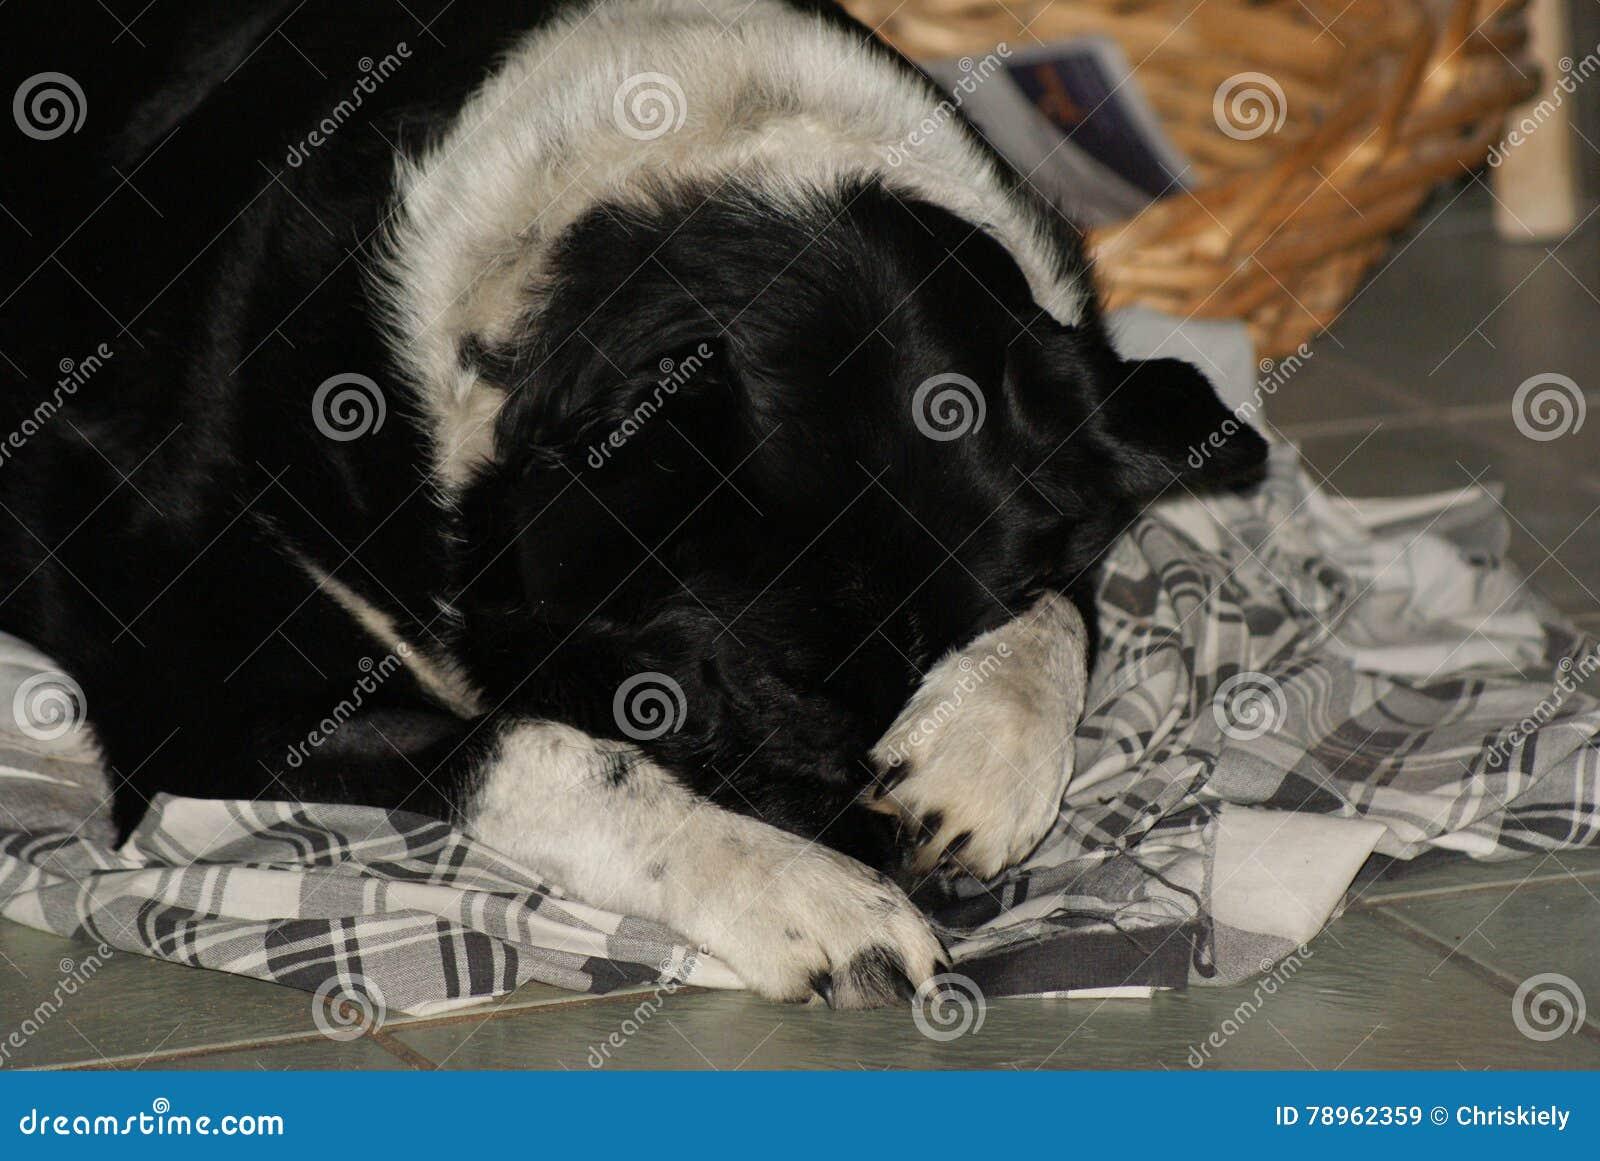 Border Collie Kelpie Pet Sleeping